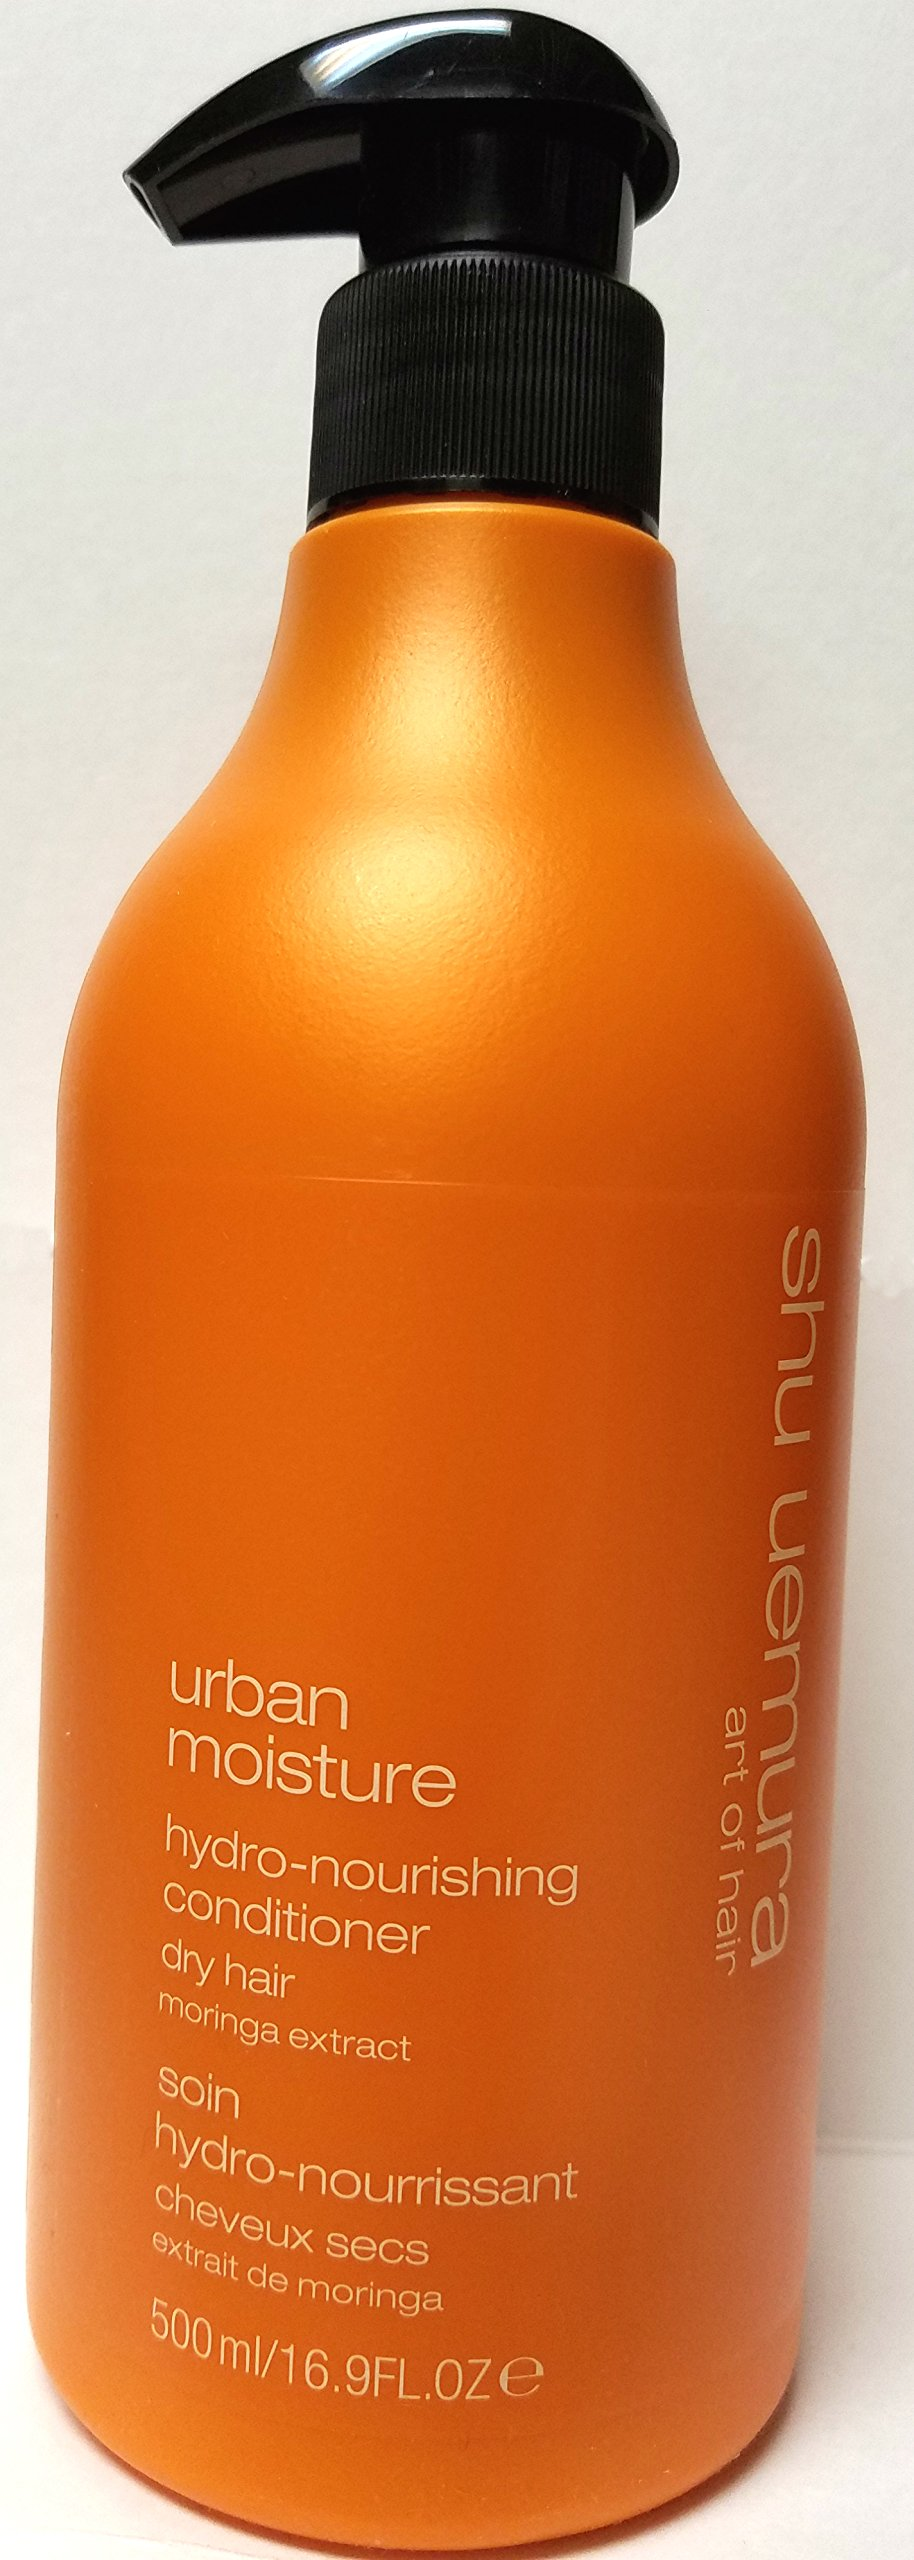 Shu Uemura Urban Moisture Hydro-Nourishing Conditioner for Unisex, 16.9 Ounce